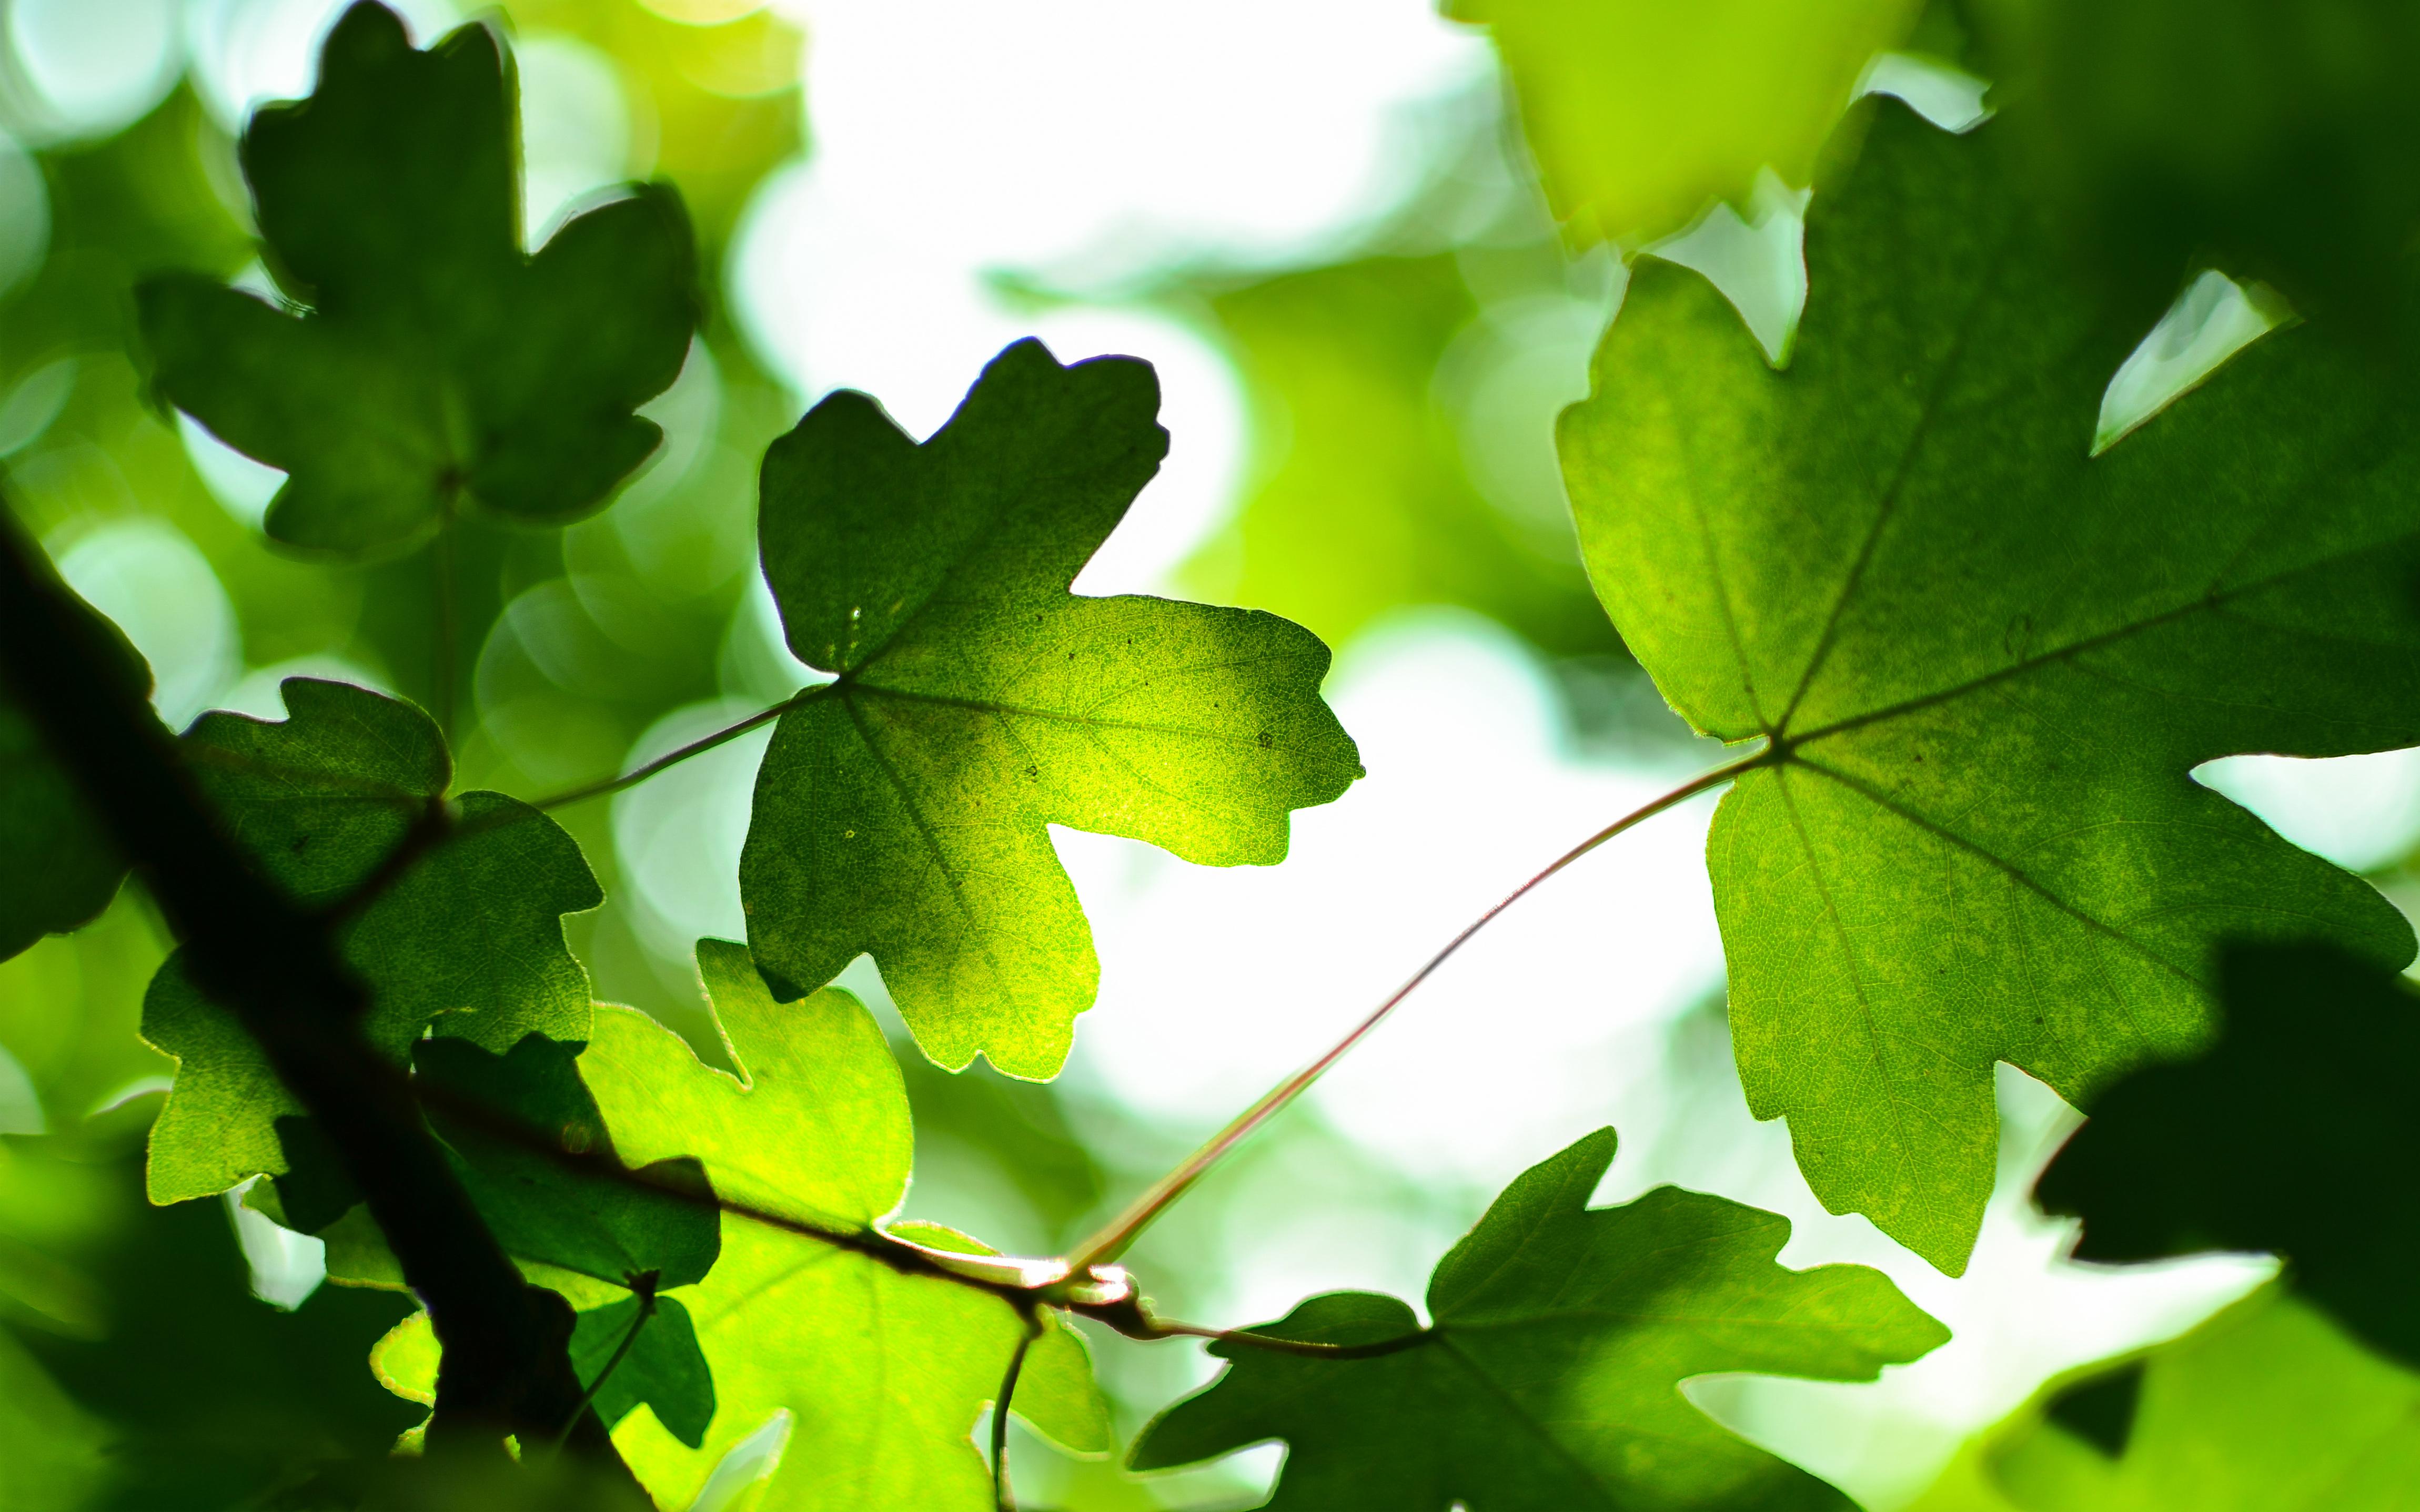 Green Leaves 4K Wallpapers | HD Wallpapers | ID #19188